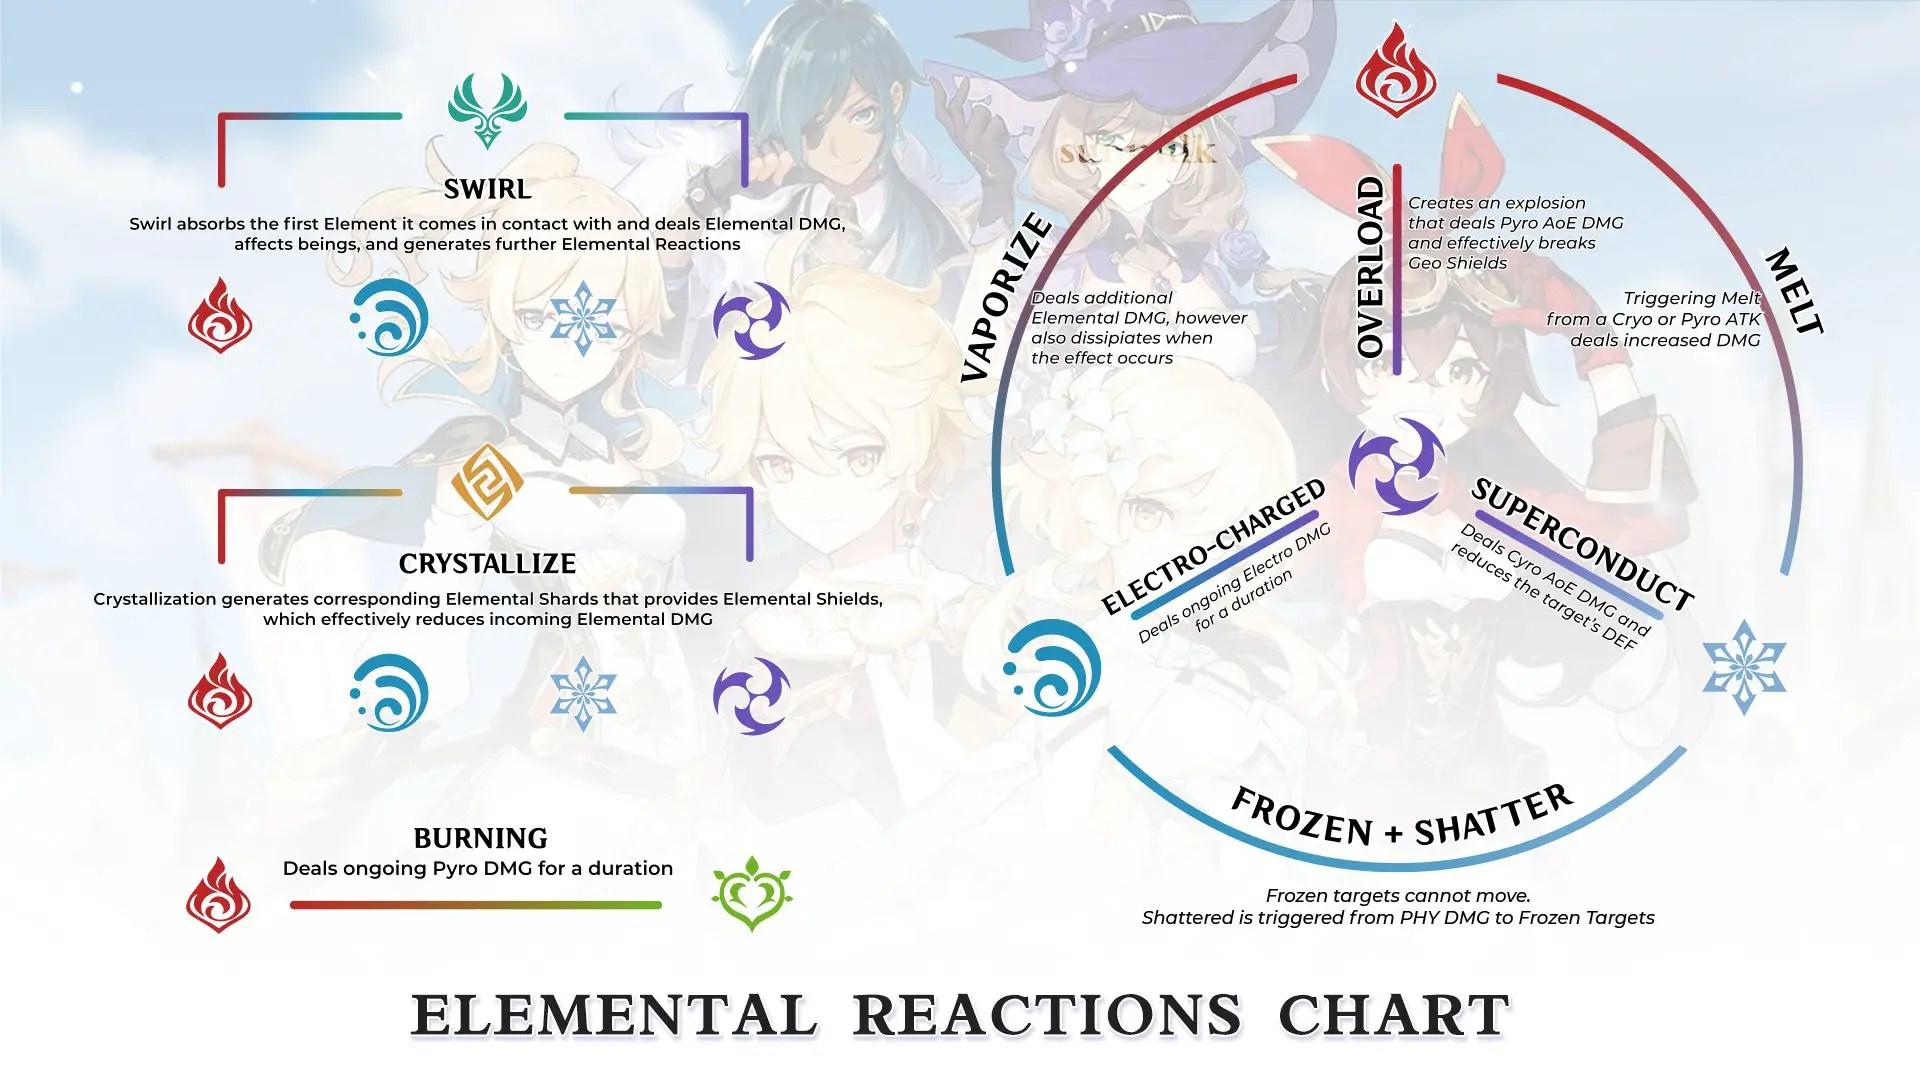 Genshin Impact Elemental Reactions Guide - ISK Mogul Adventures